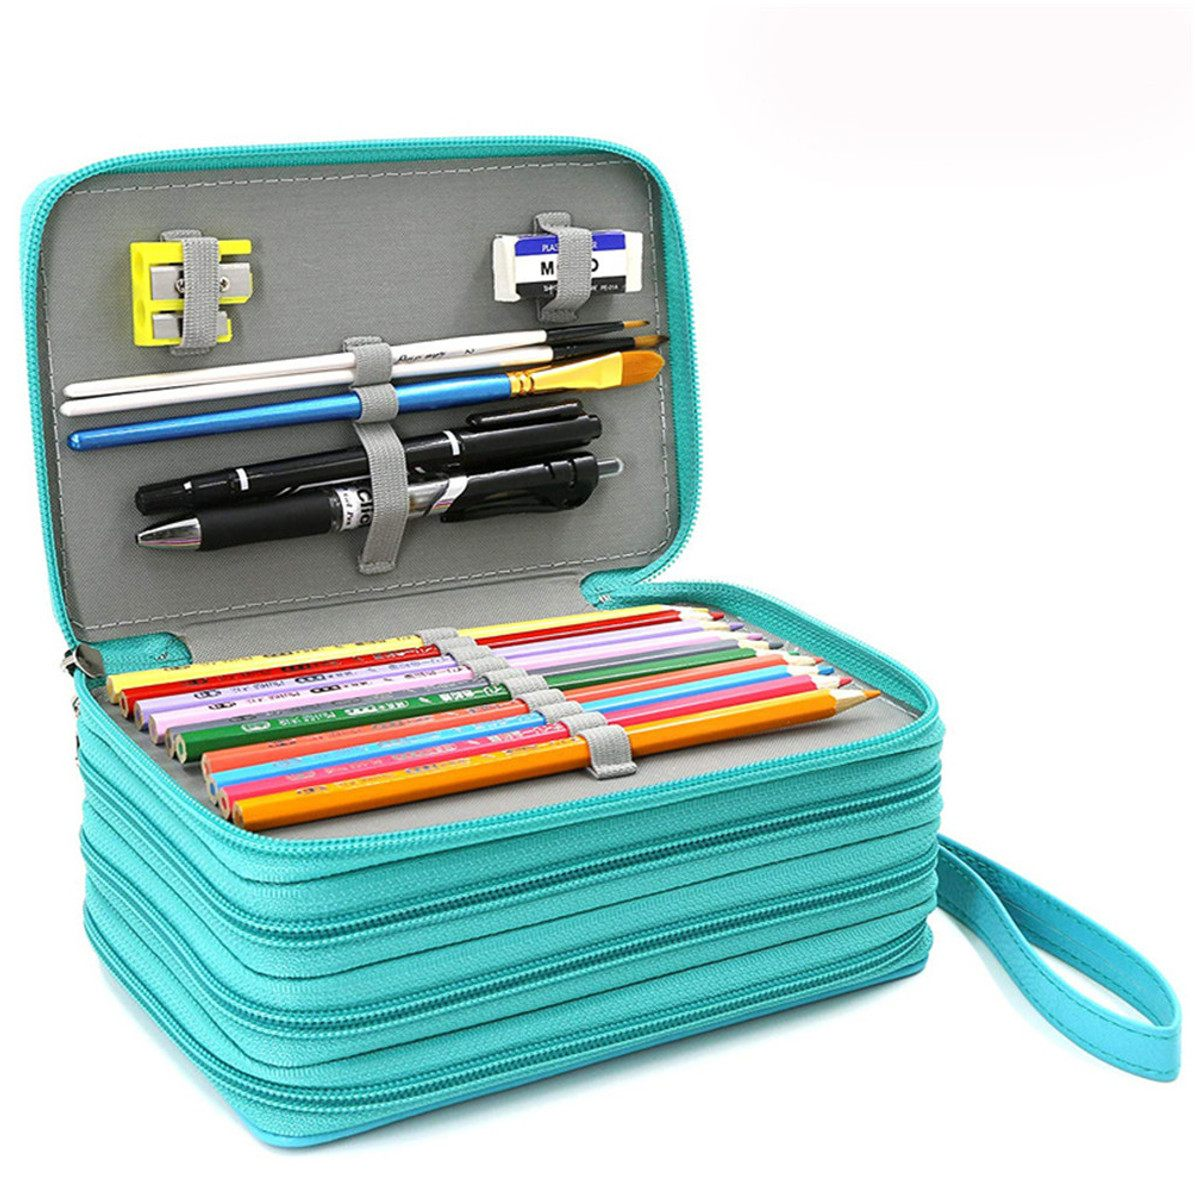 3 Colors School Pencil Case 72 Holes Penal Pencilcase for Girls Boys Pen Bag Large Cartridge Penalties Big Box Stationery Pouch